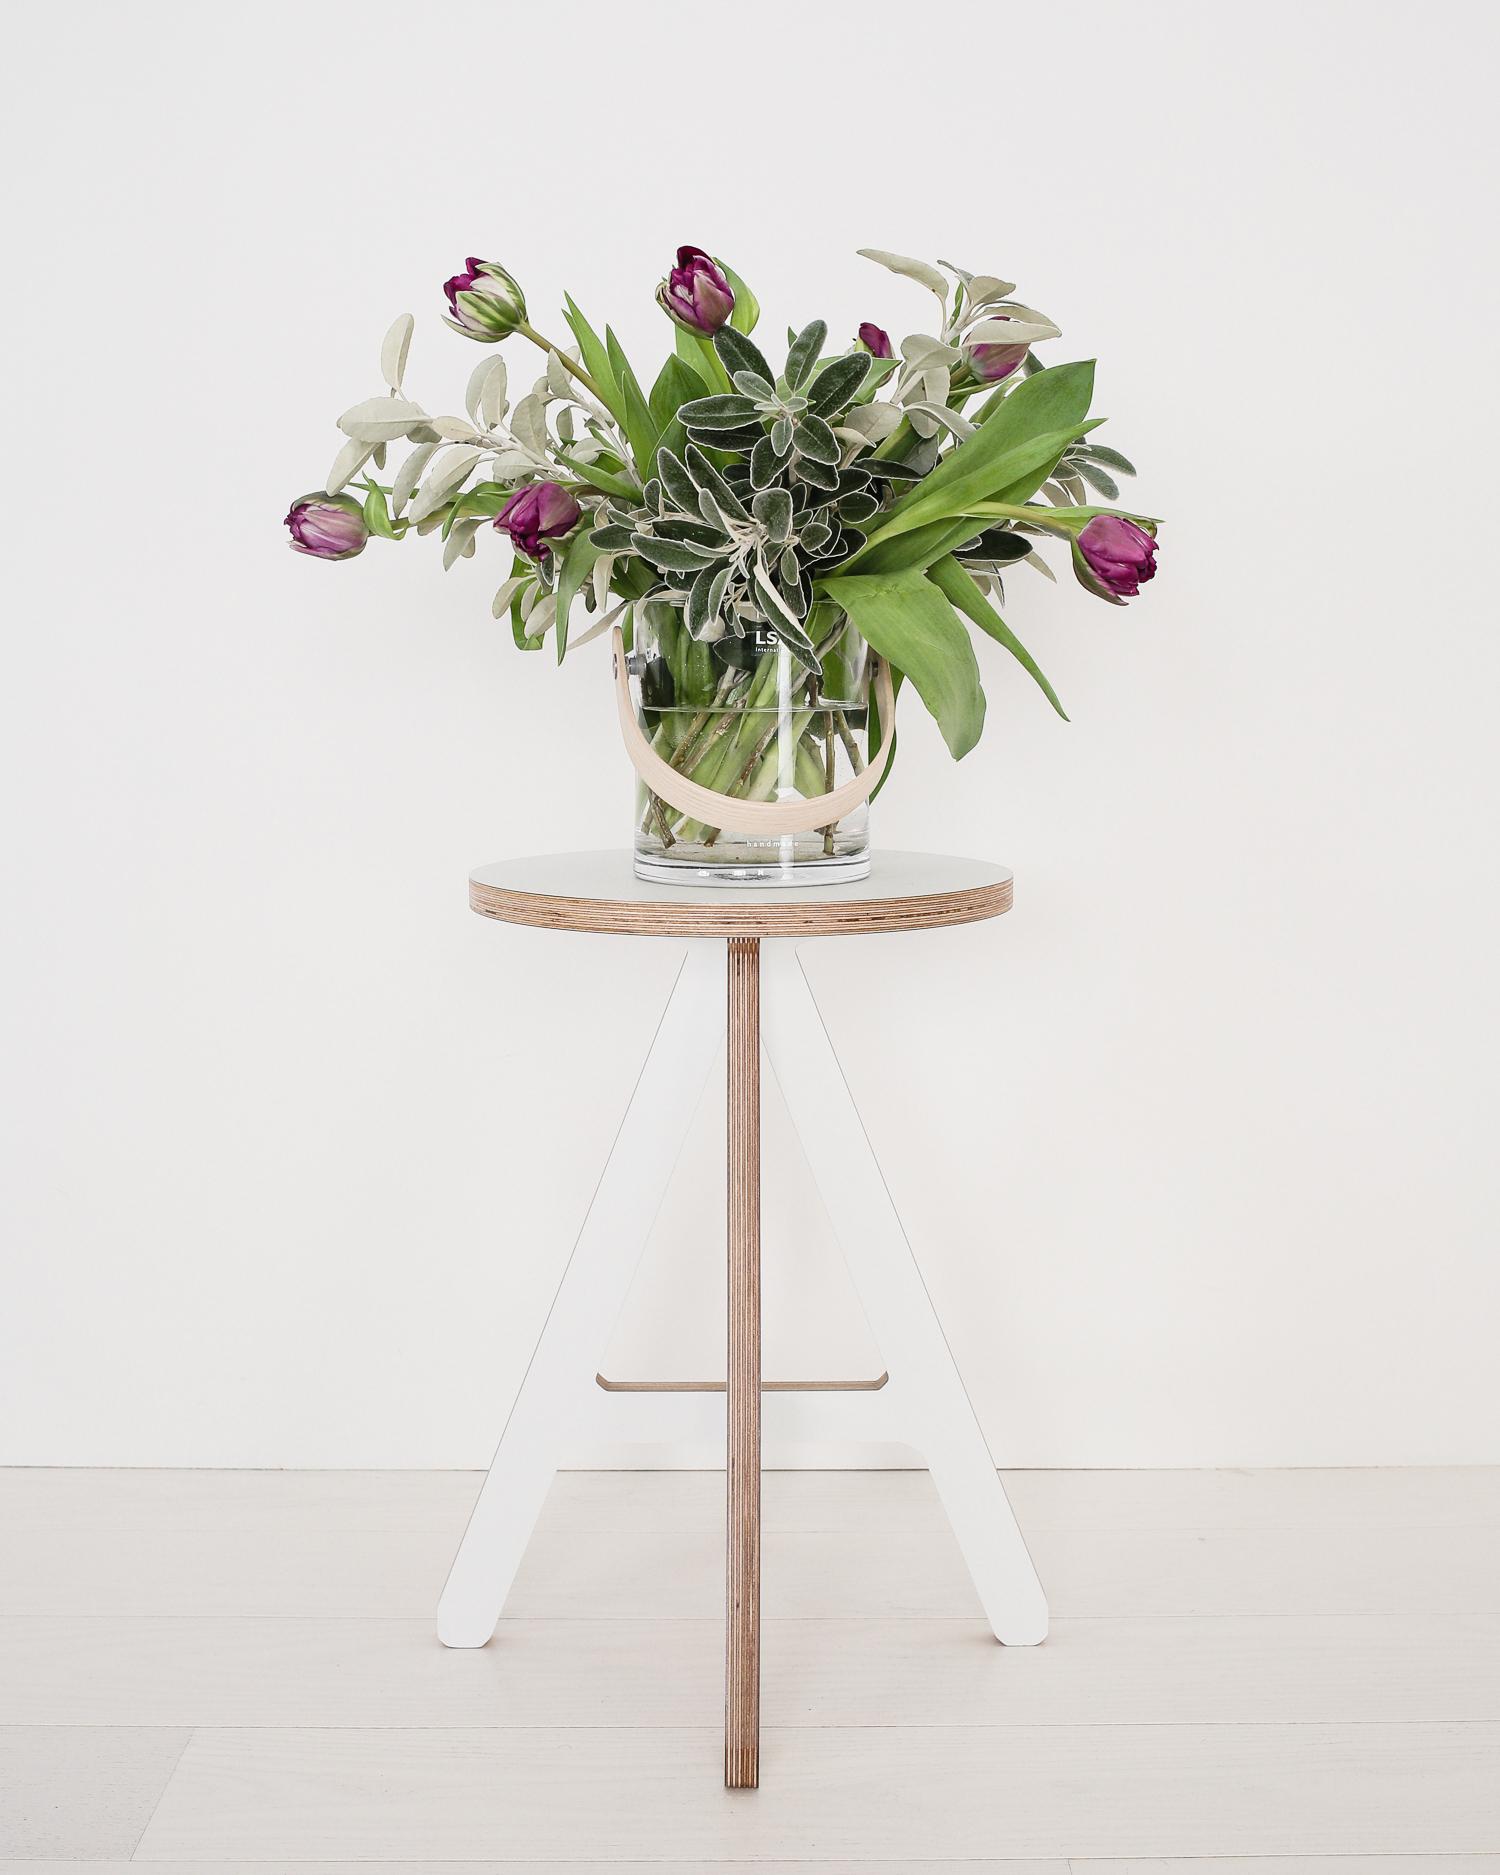 Tulips on white ByAlex stool | Design Hunter